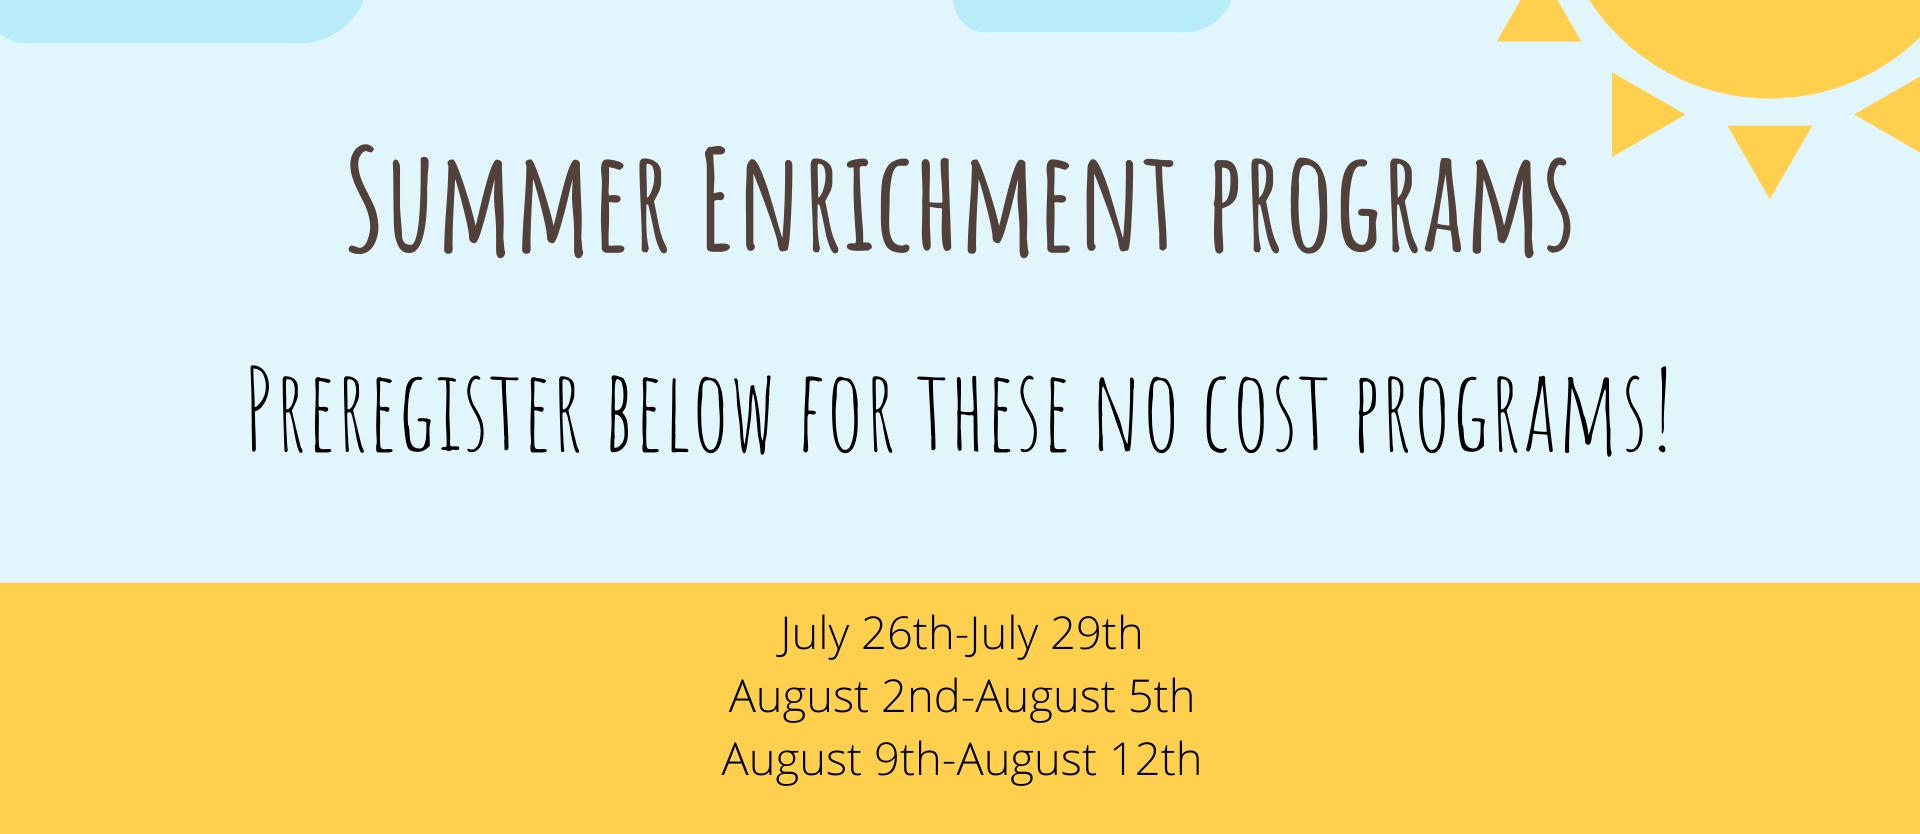 Summer Enrichment